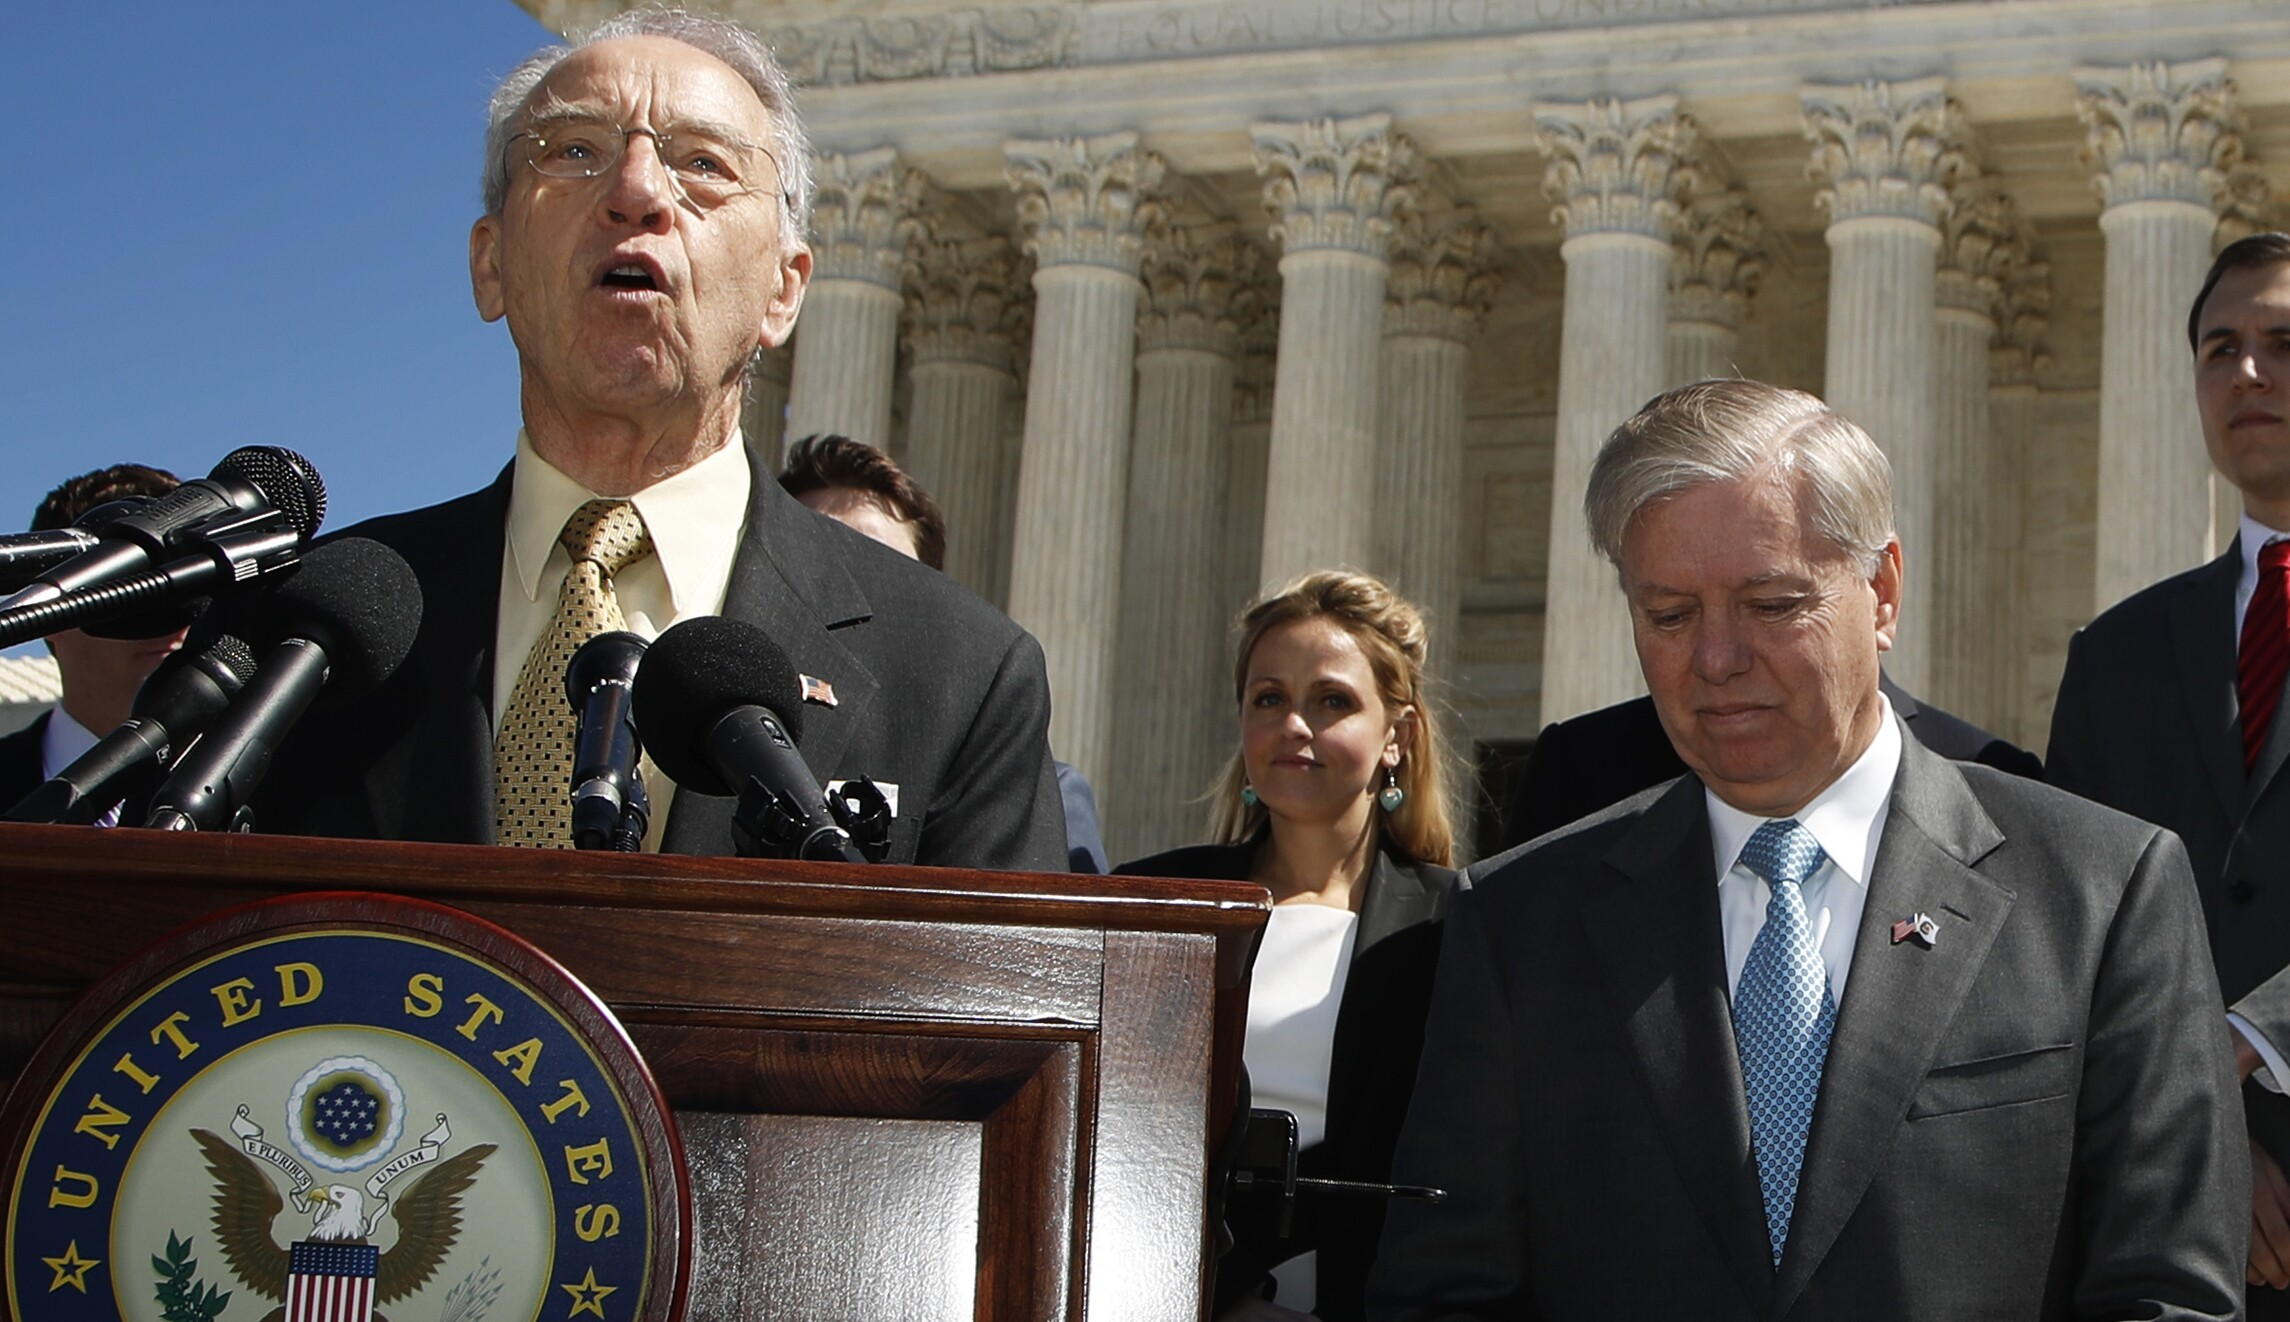 Republican lawmakers renew calls for second special counsel amid DOJ